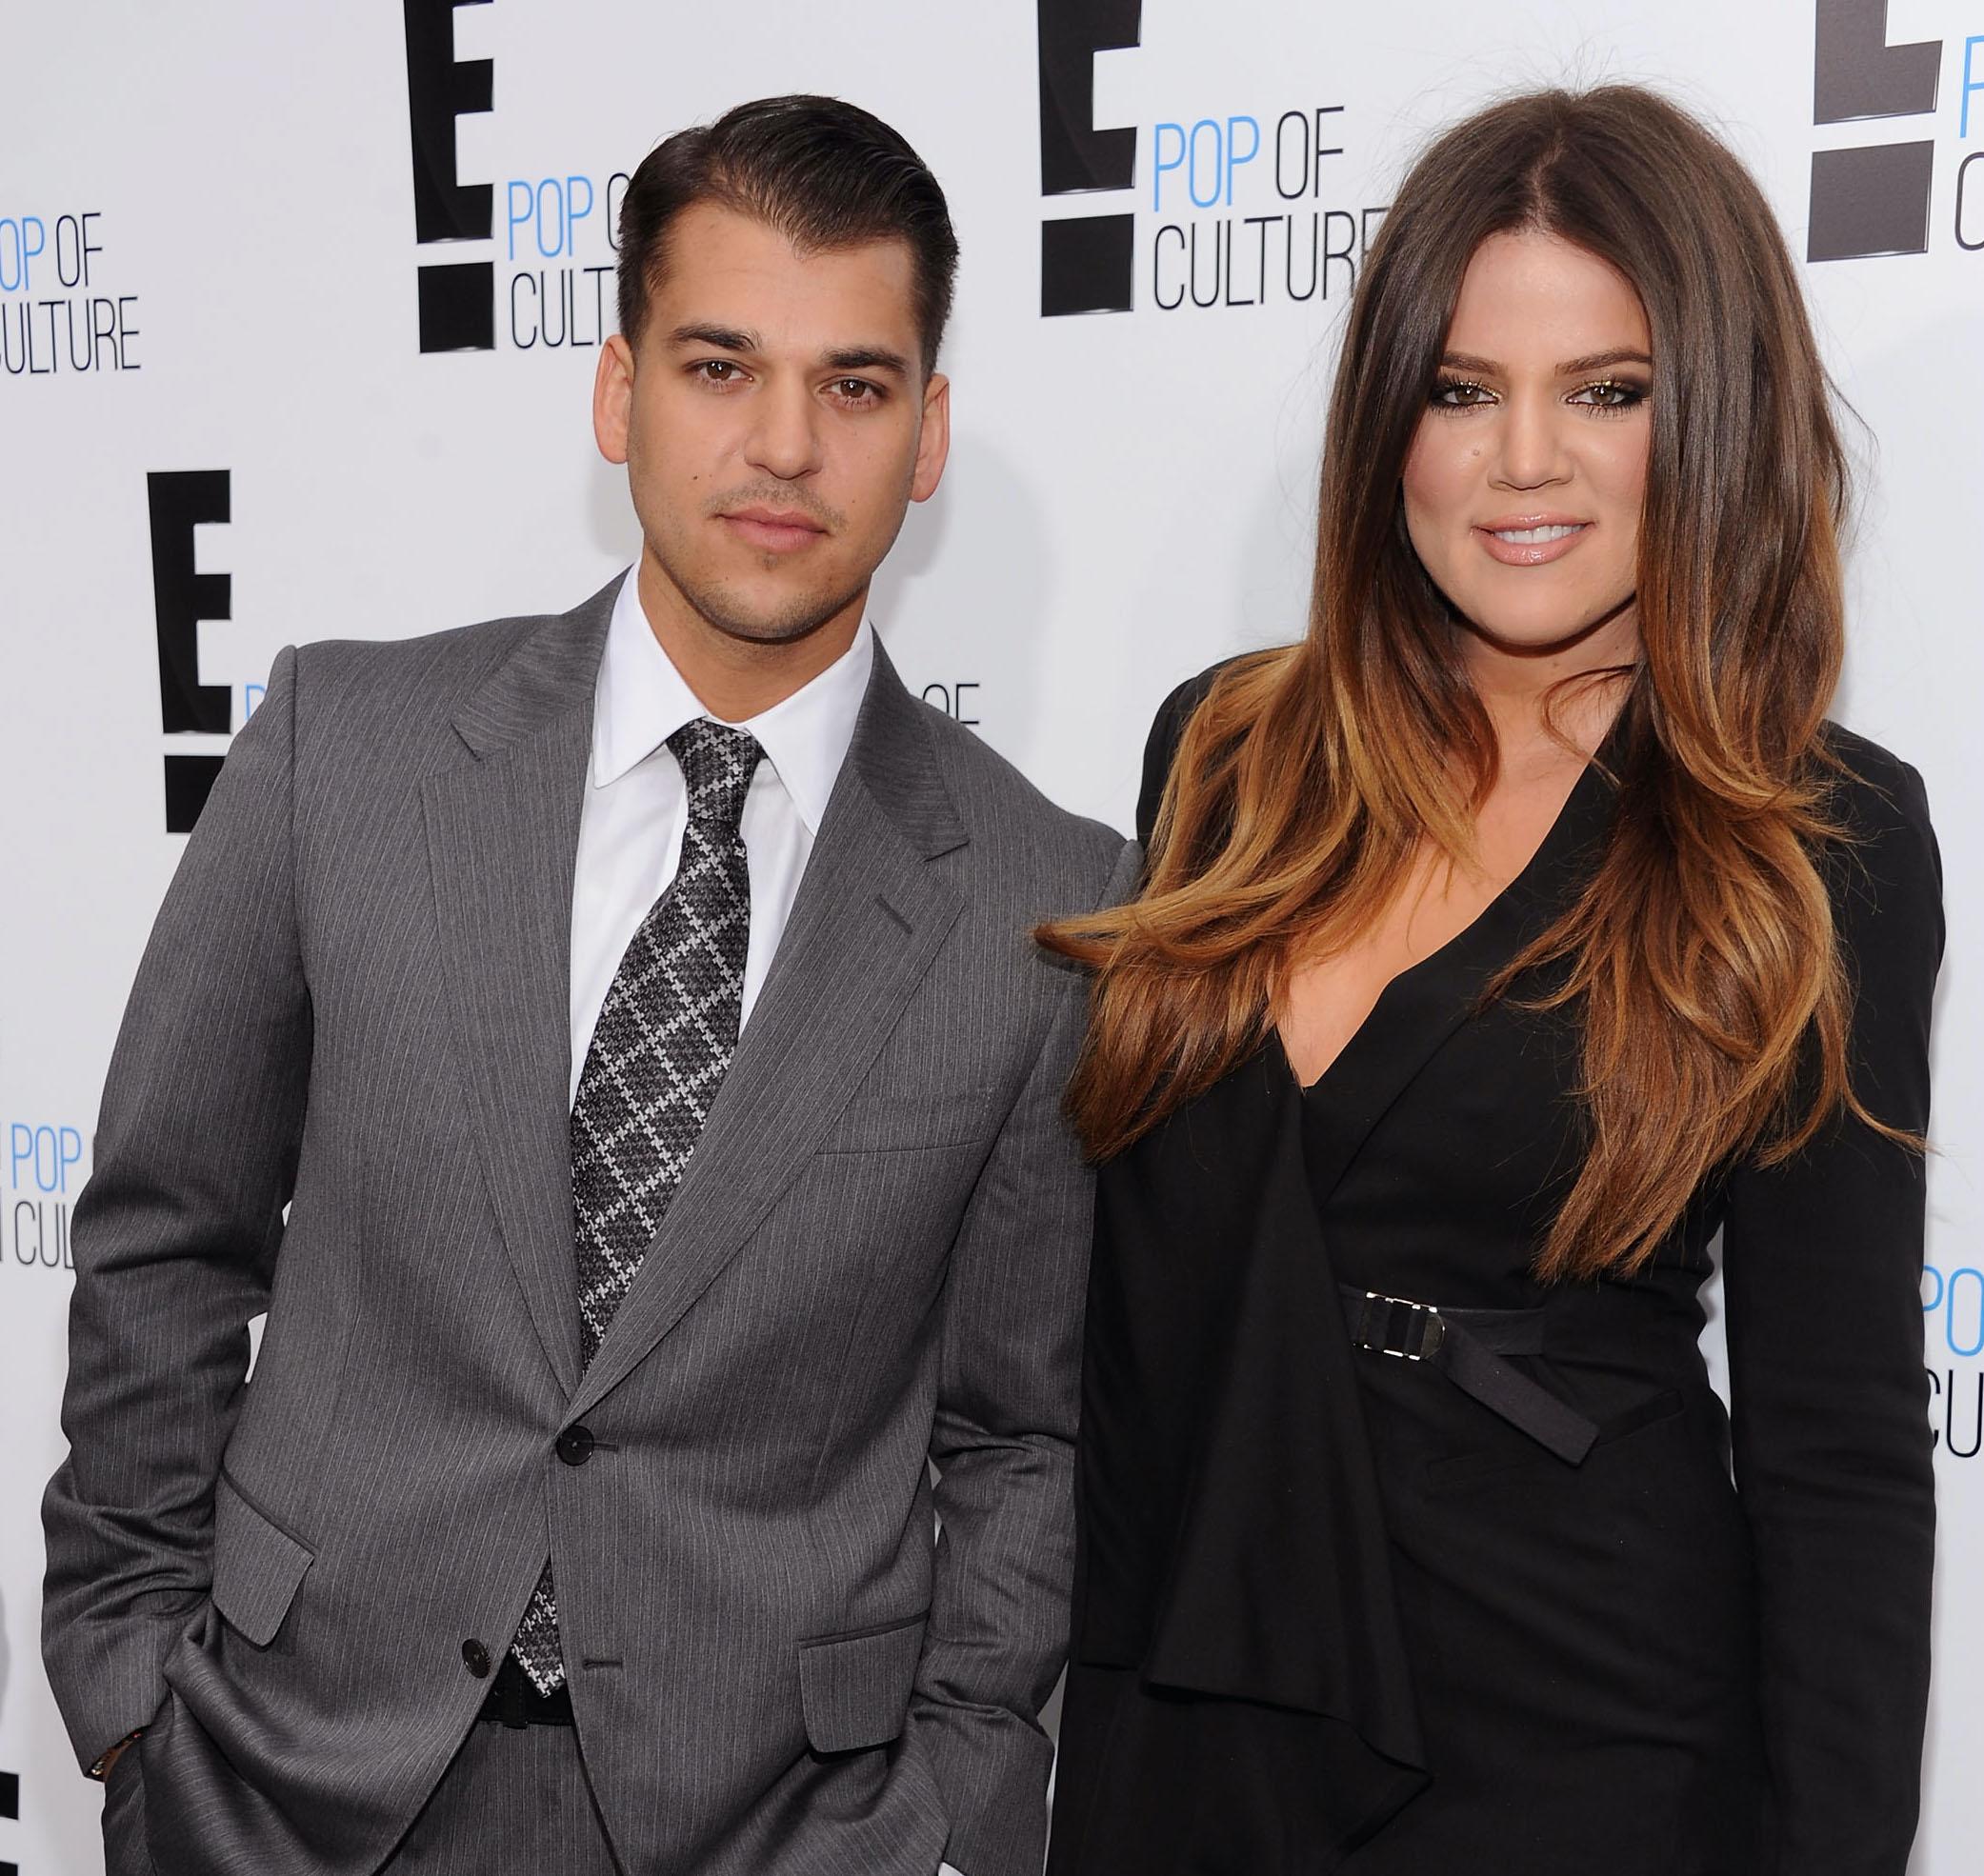 Rob and Khloé Kardashian